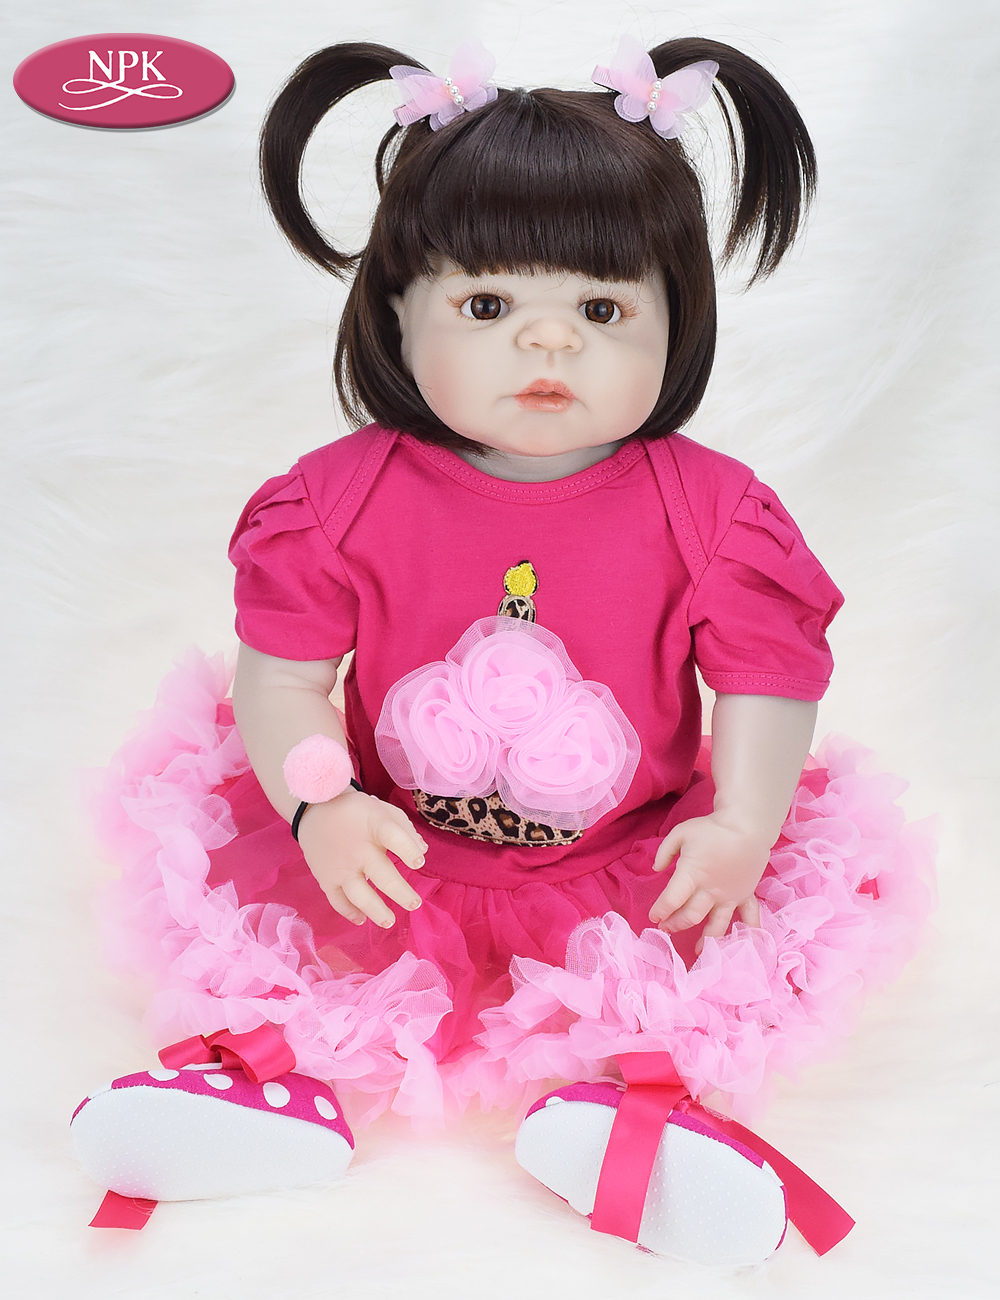 NPK 57CM Full Body Soft Silicone Girls Reborn Baby Doll Bathe Toys Lifelike Princess Girl Dolls Bebe Real Reborn Boneca Menina  (11)